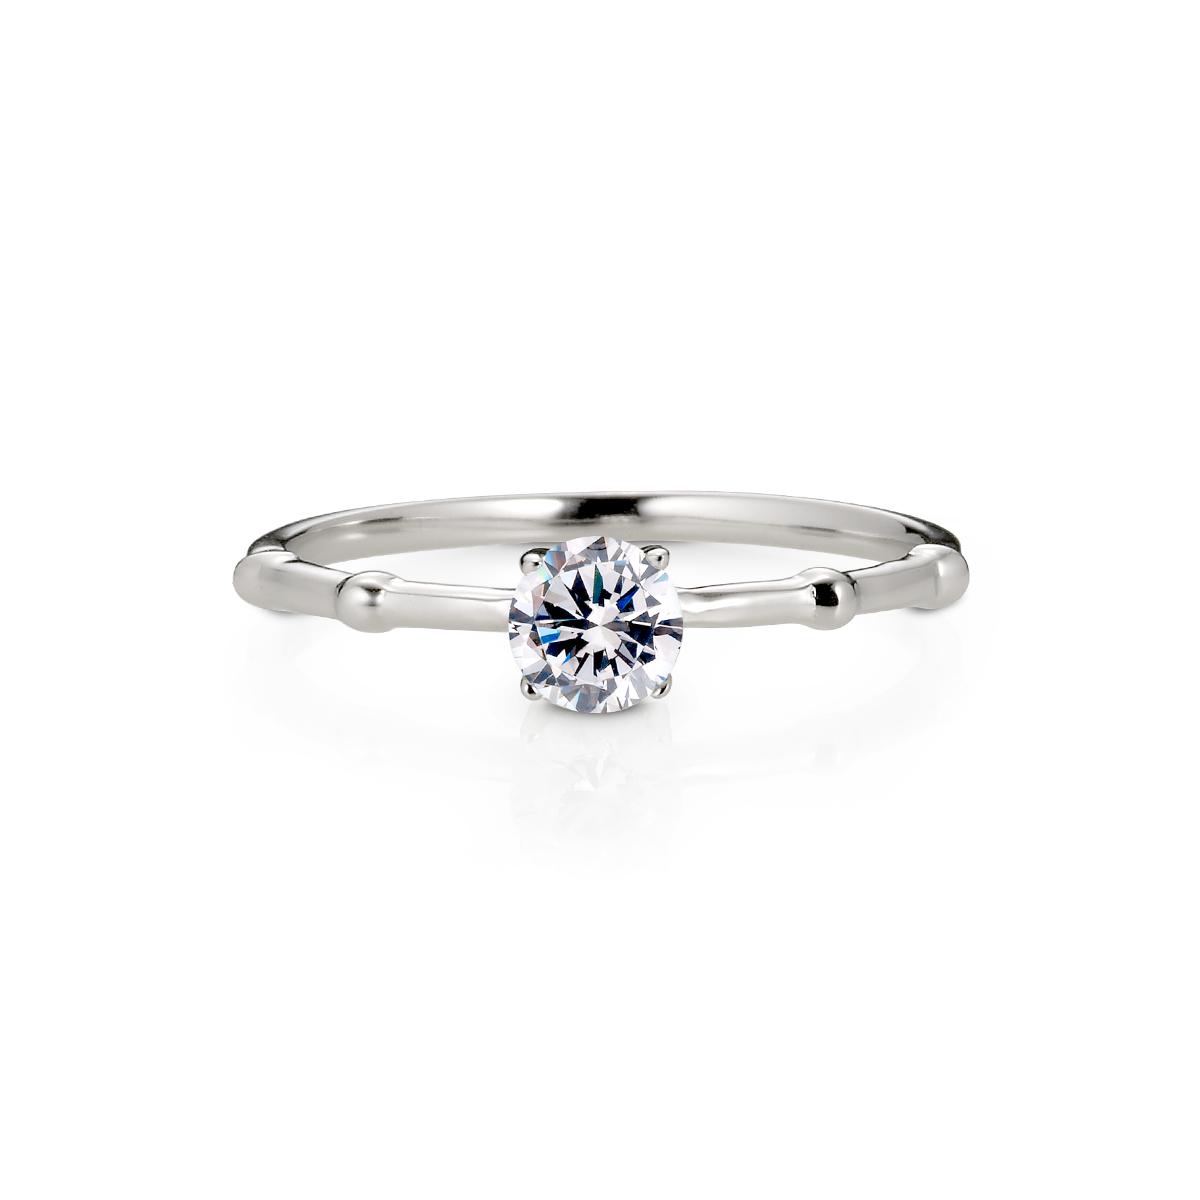 KSW215 細緻典雅戒指